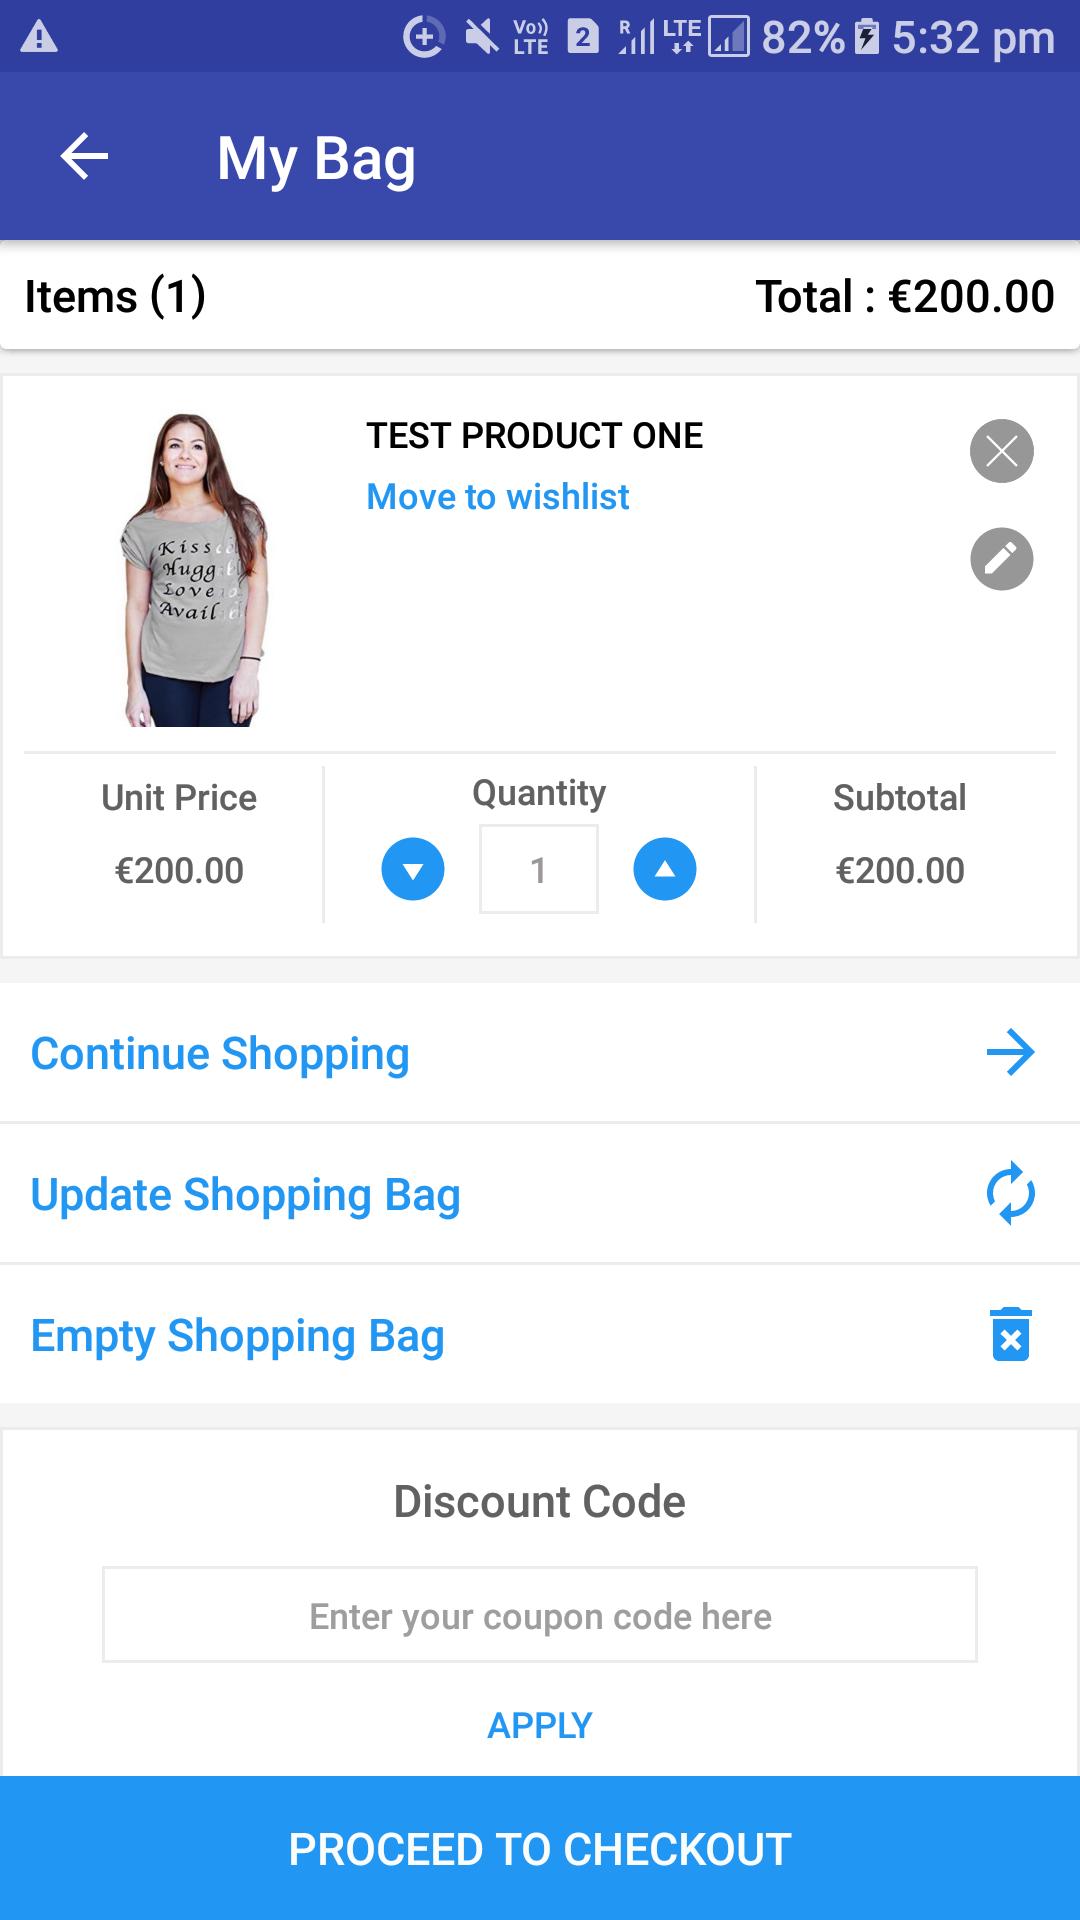 Opencart Mobikul Wallet - Apply Discount Code